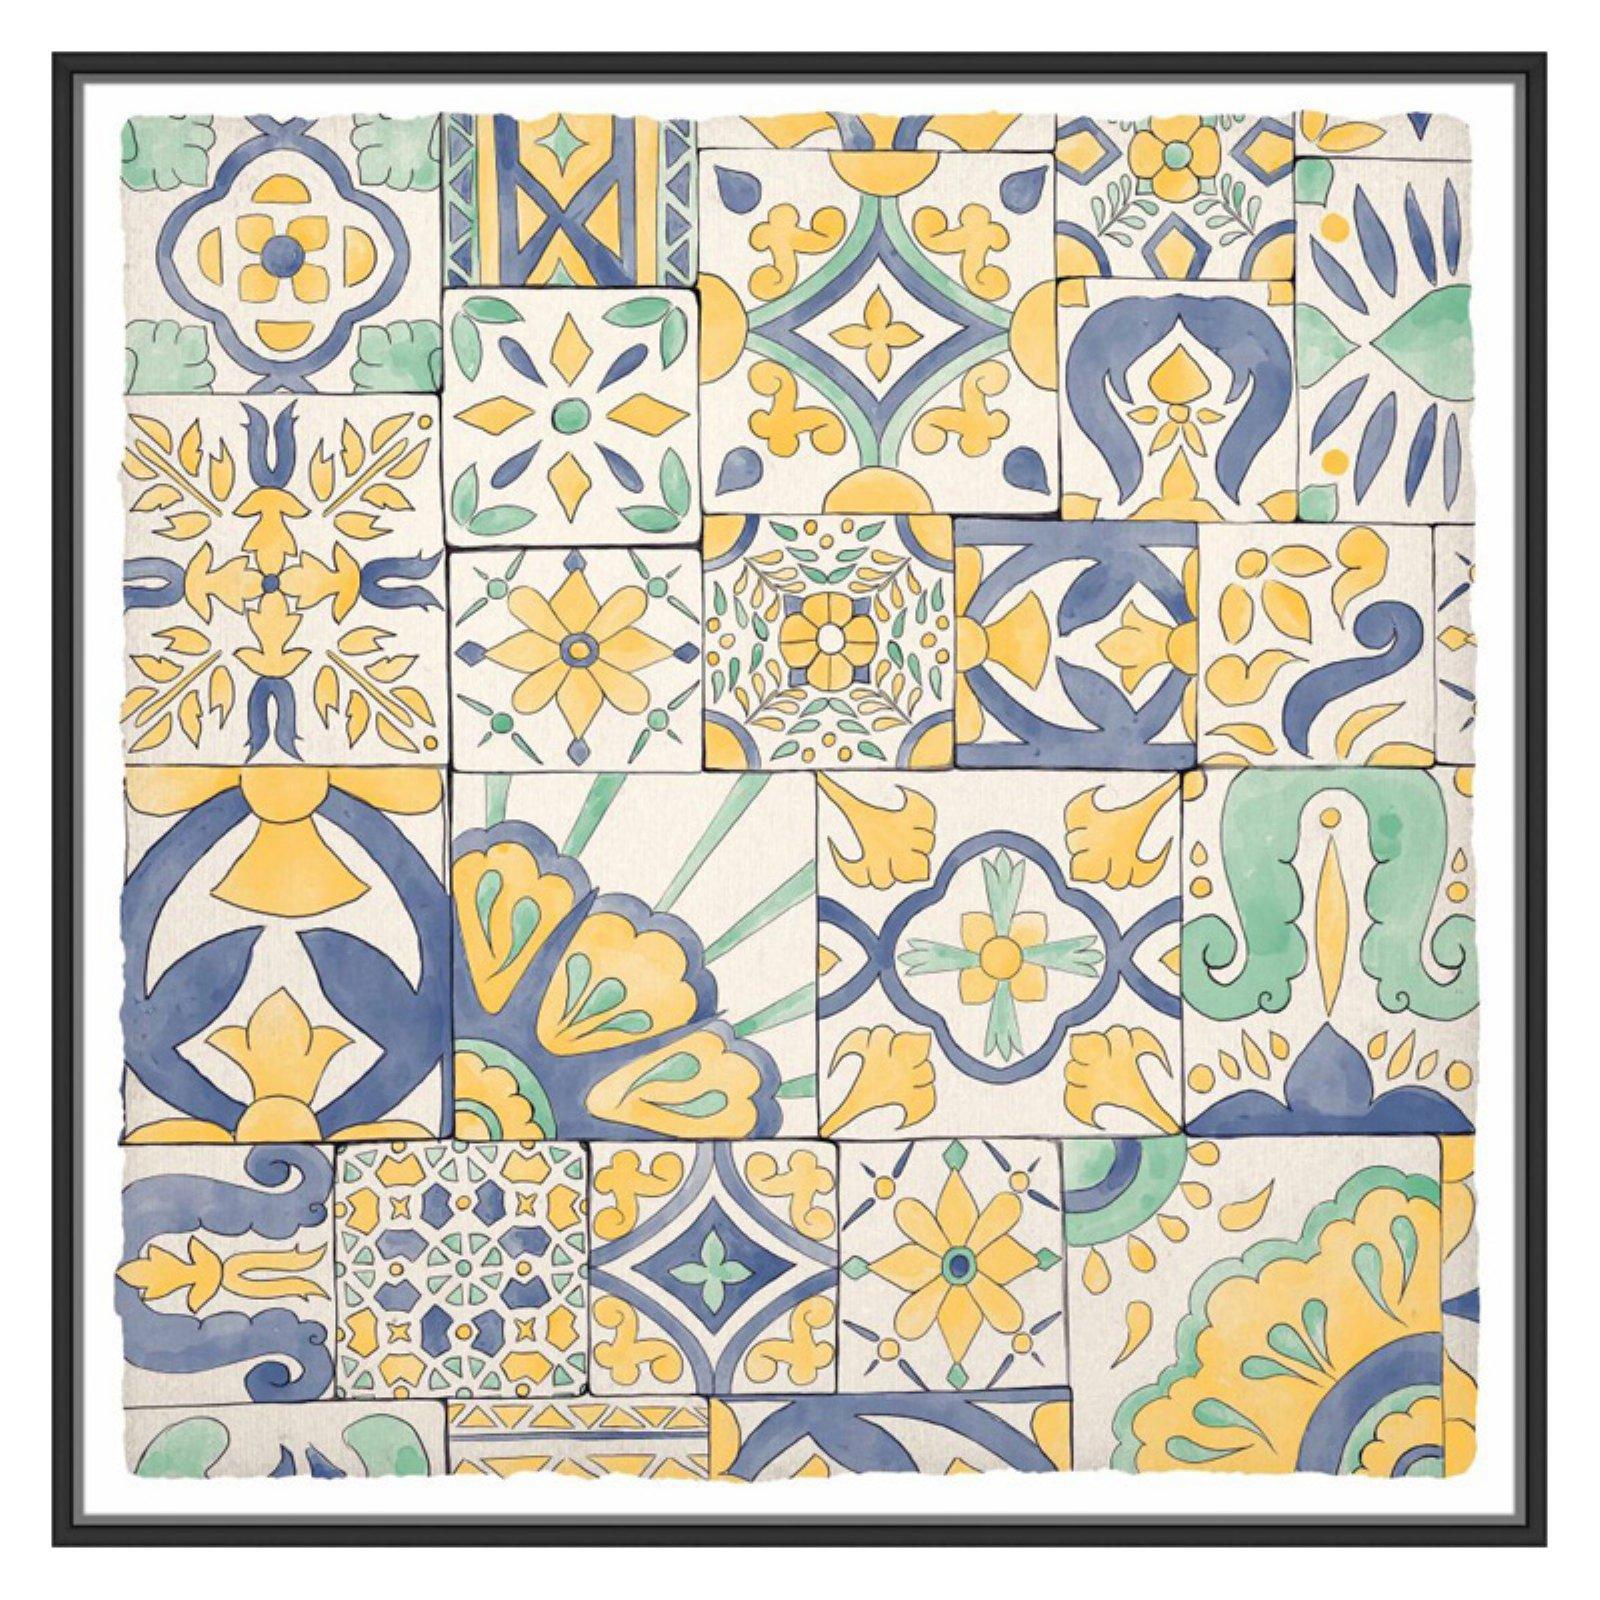 Ptm Images Mandala Puzzle Ii Wall Art Wall Art Art Wall Art Decor